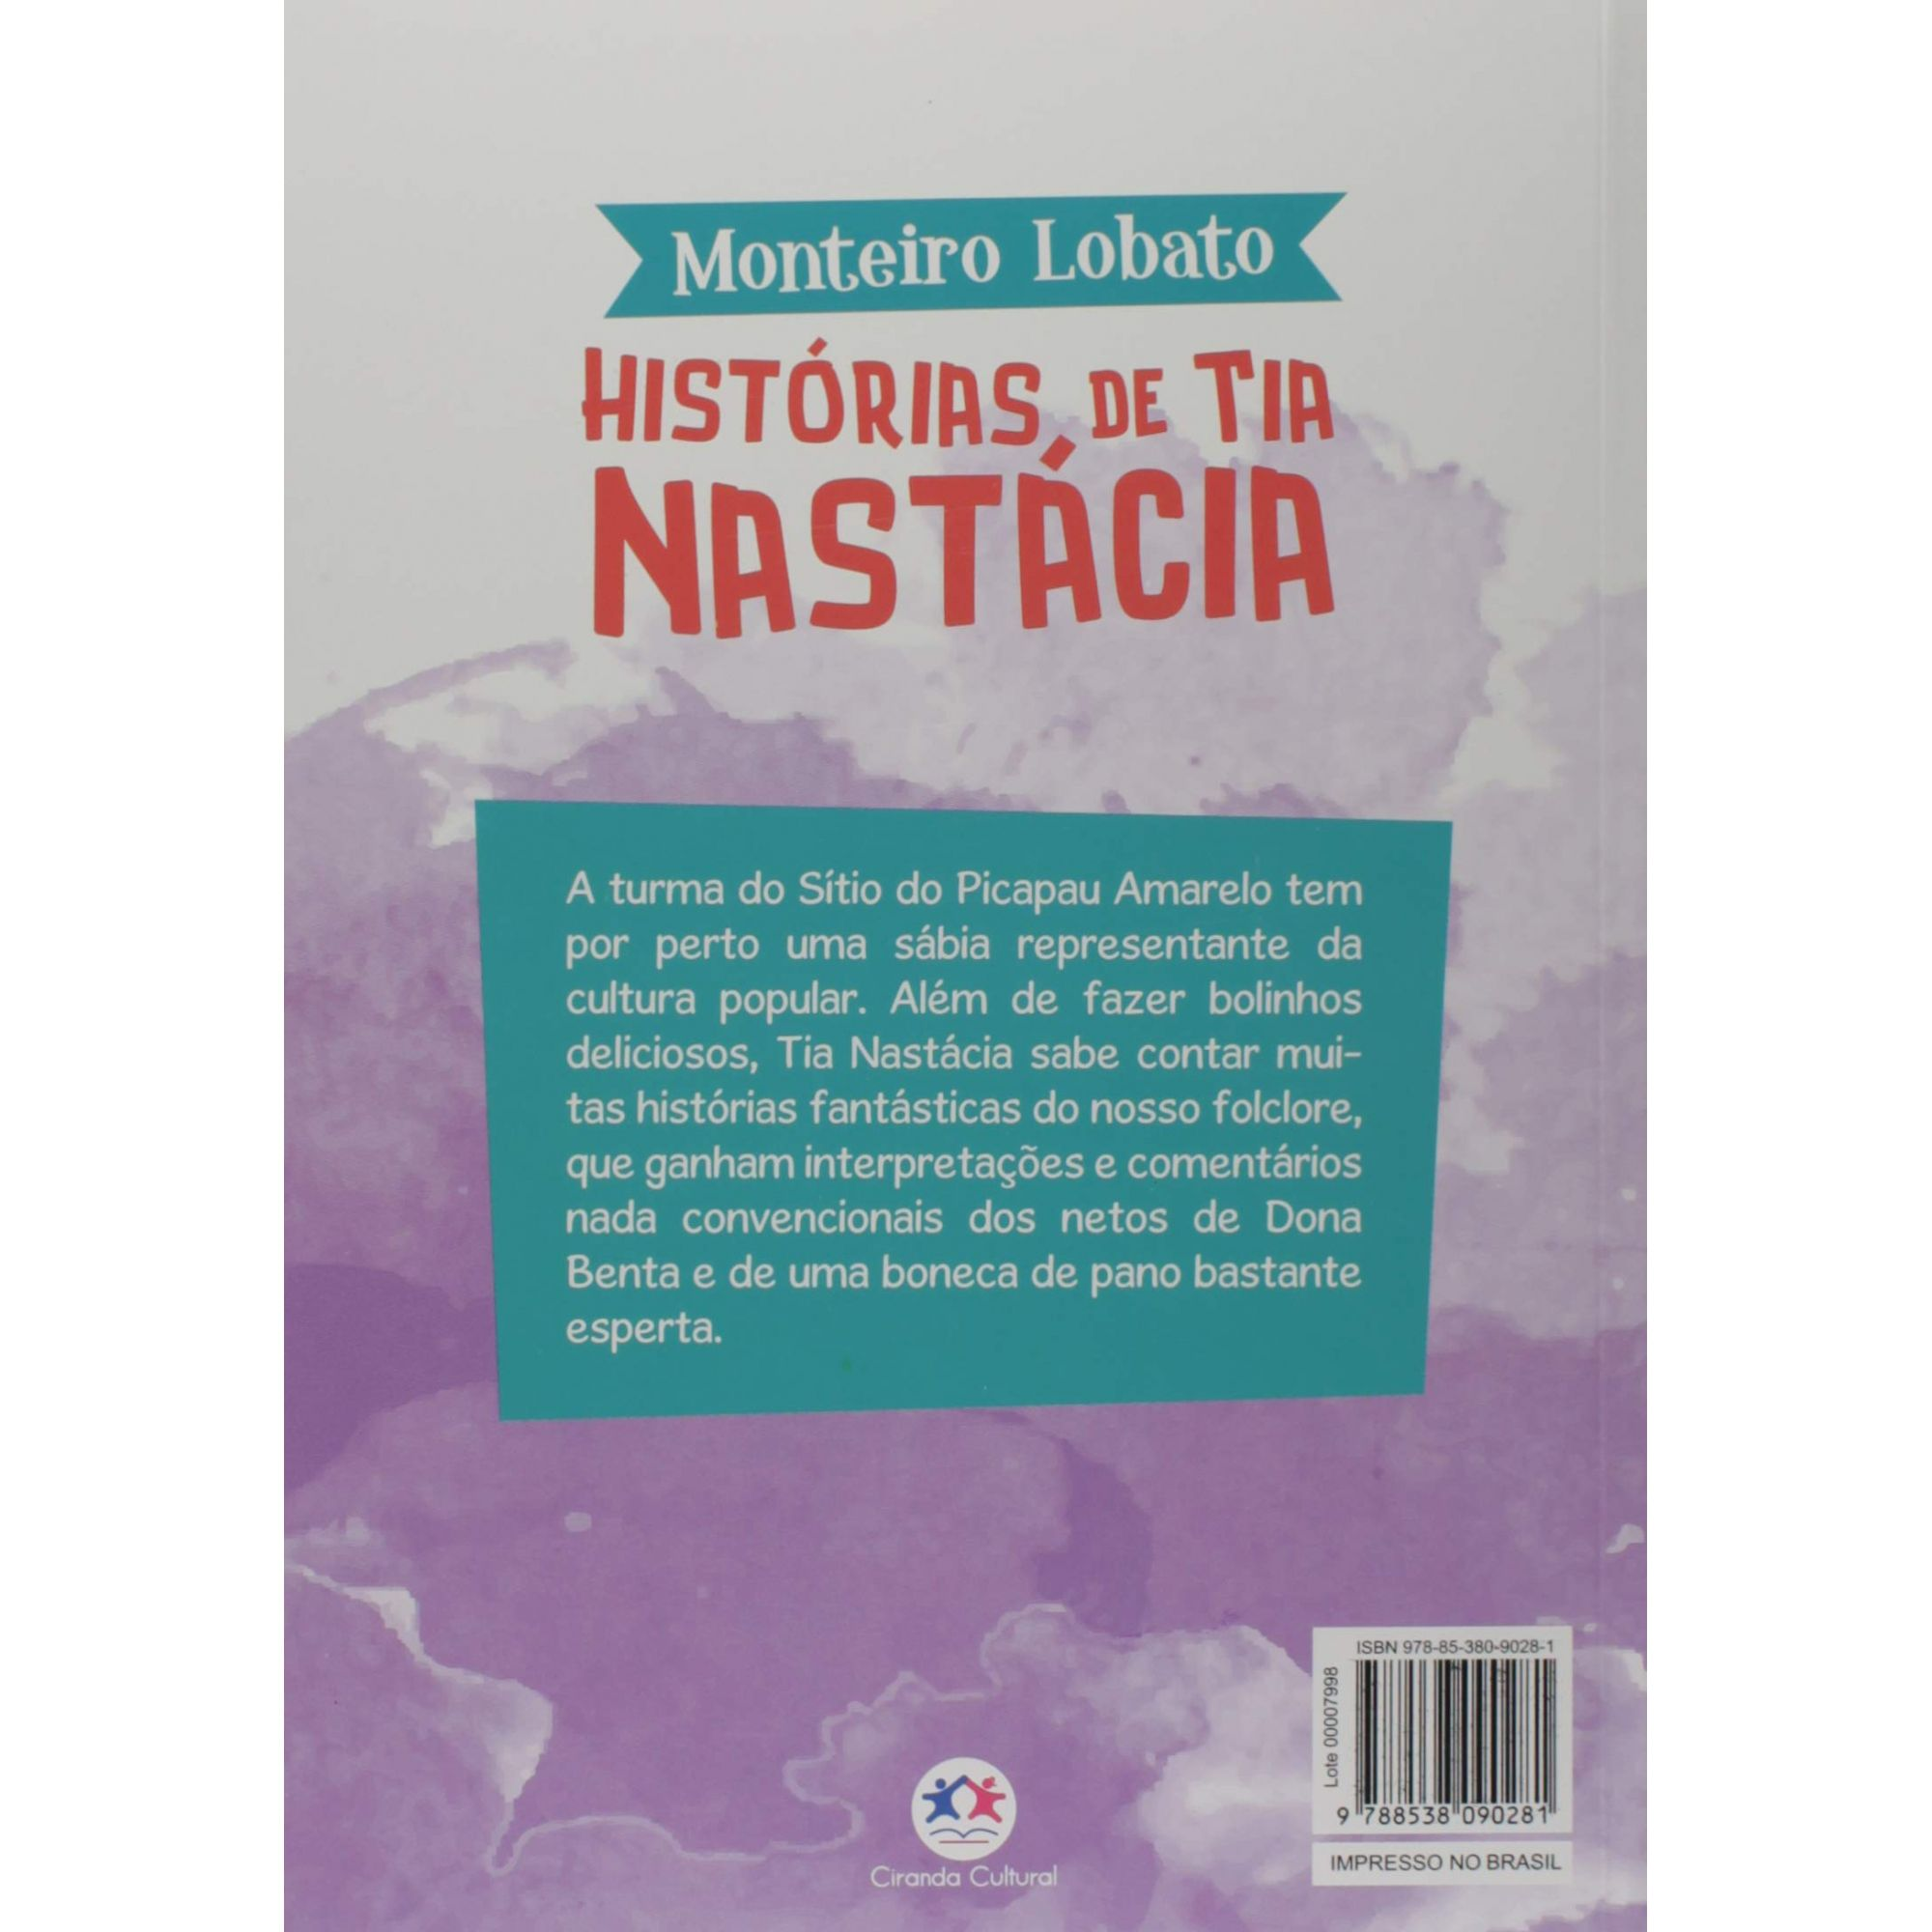 A TURMA DO SITIO - HISTORIAS DA TIA NASTACIA